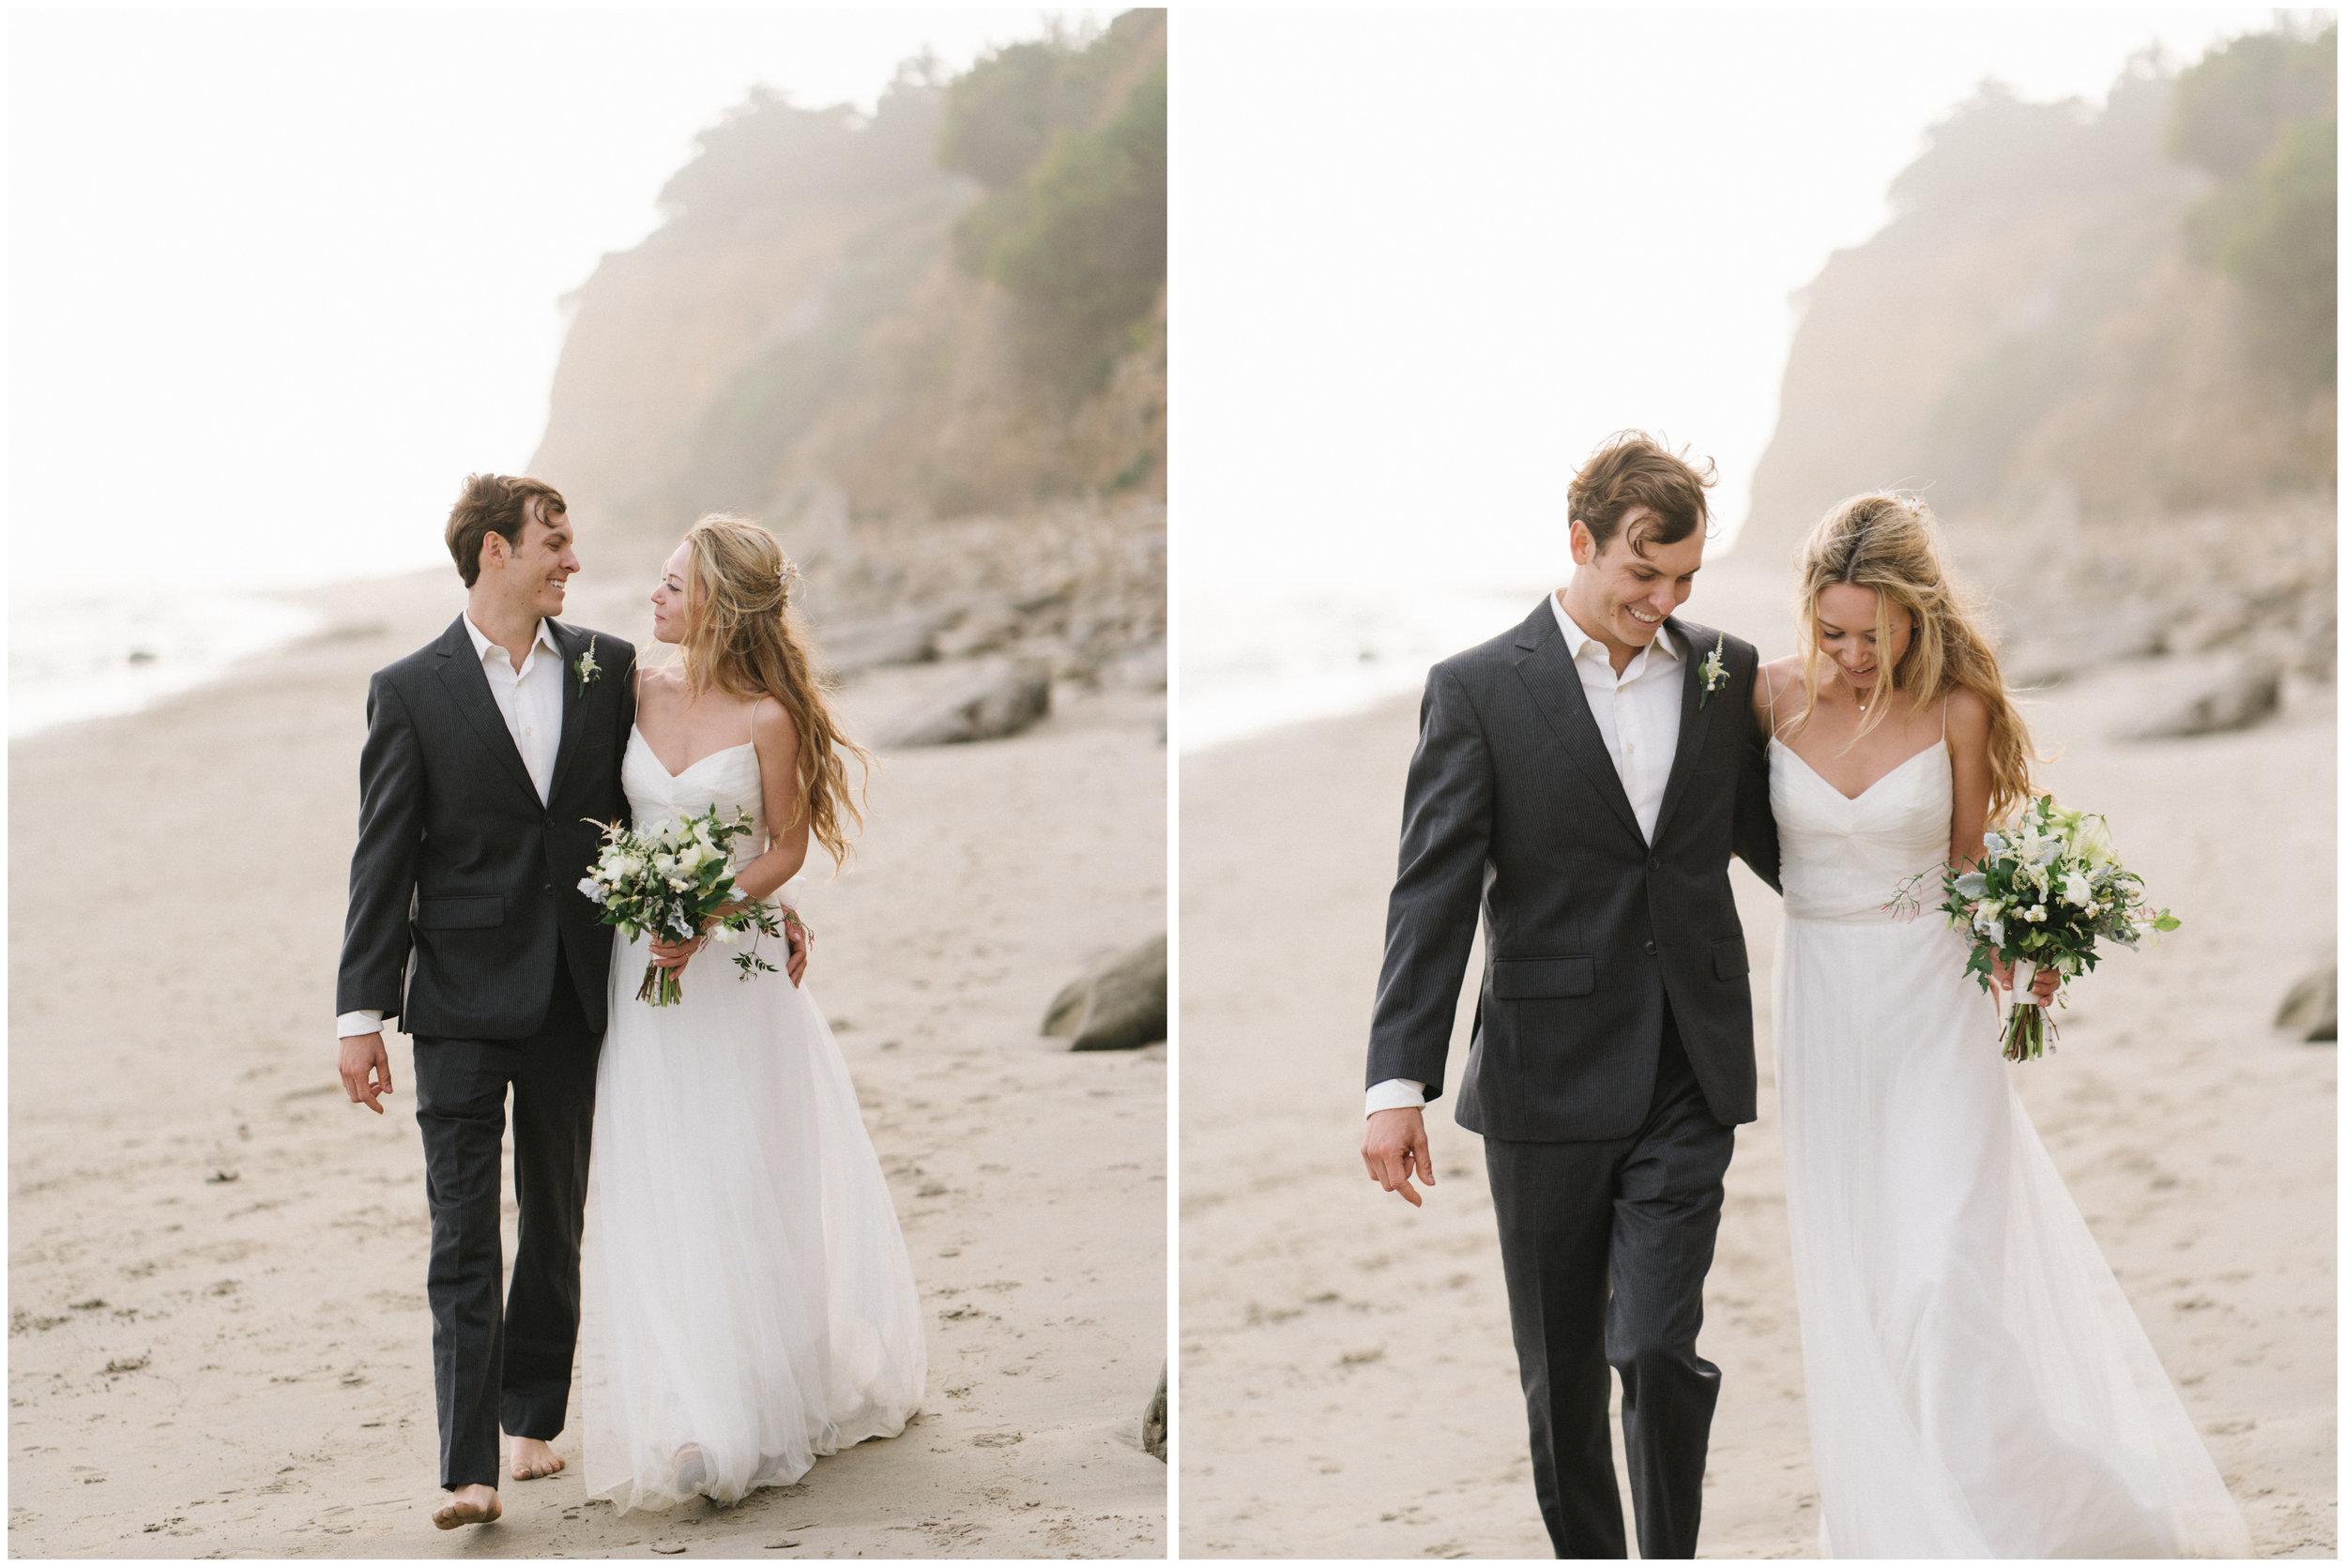 Santa Barbara Elopement Wedding Photographer - Pinnel Photography-16.jpg